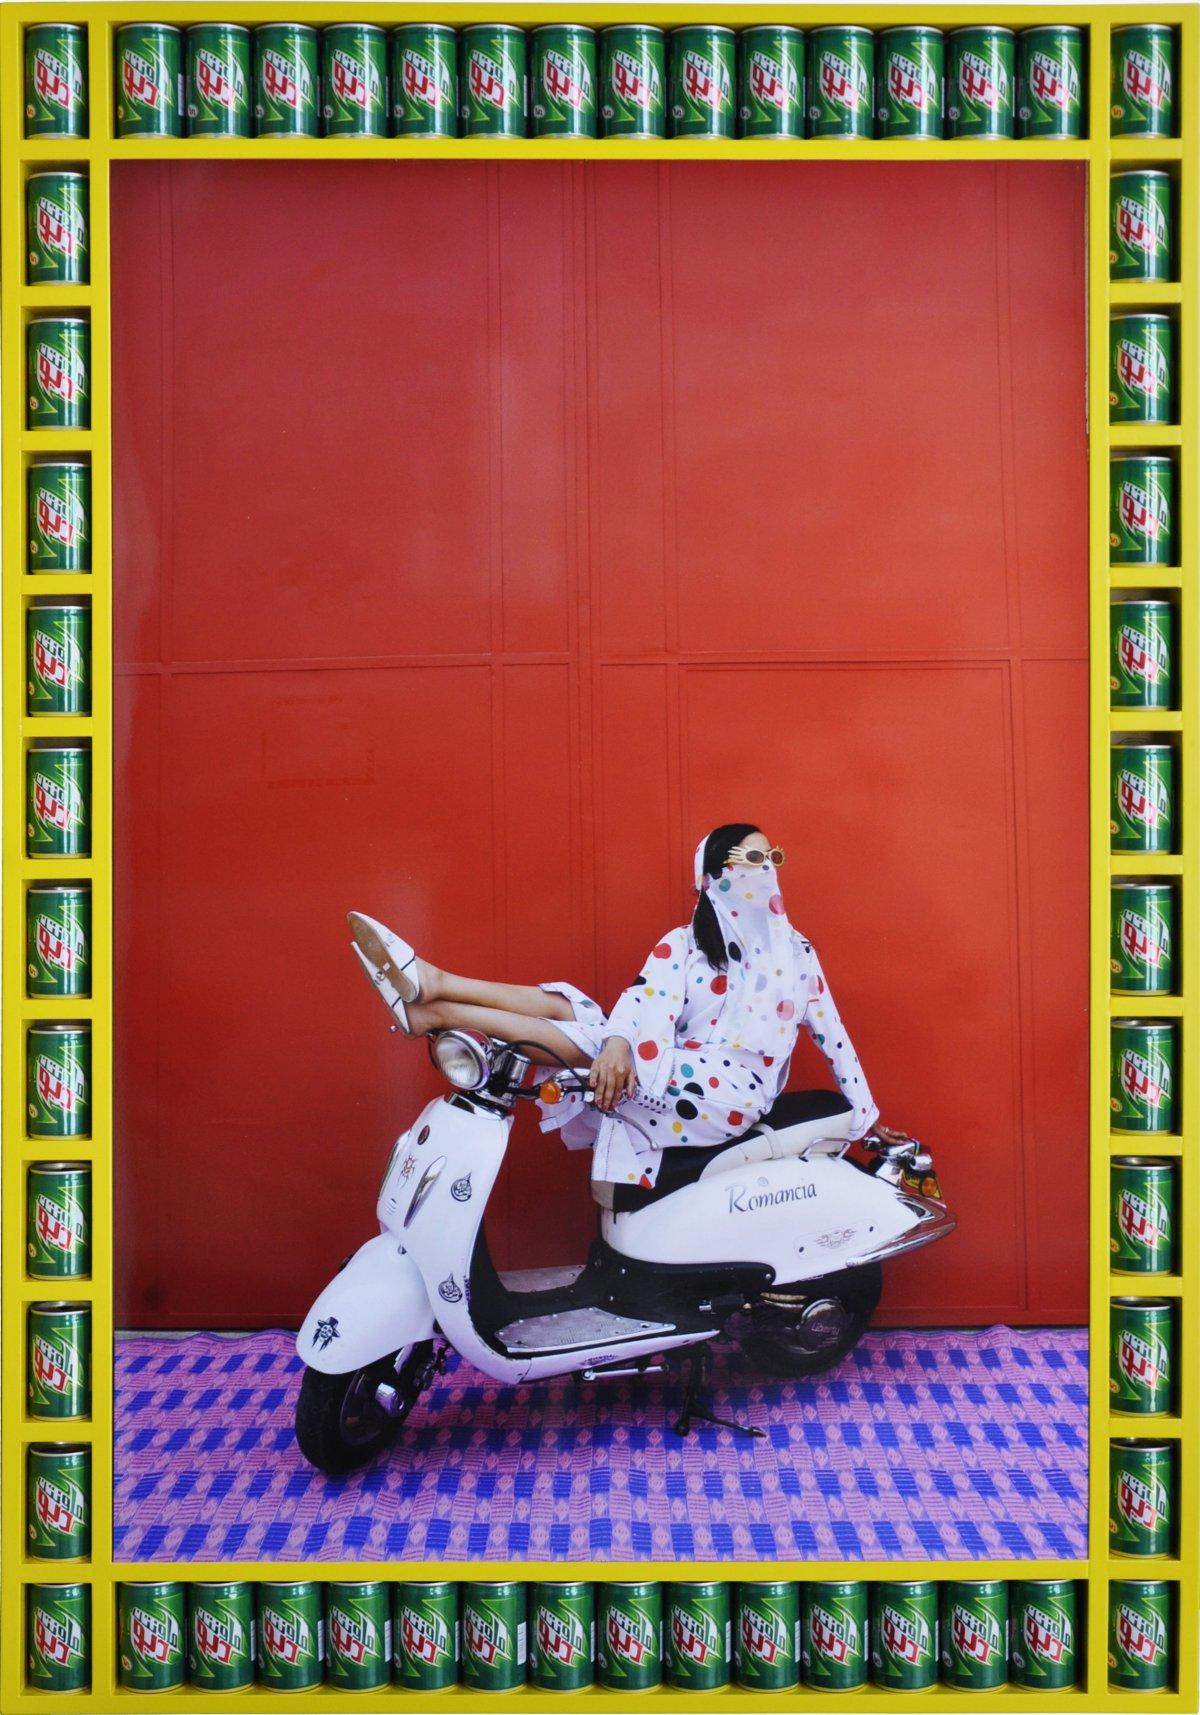 'Kesh Angels: Las mujeres motociclistas de Hassan Hajjaj